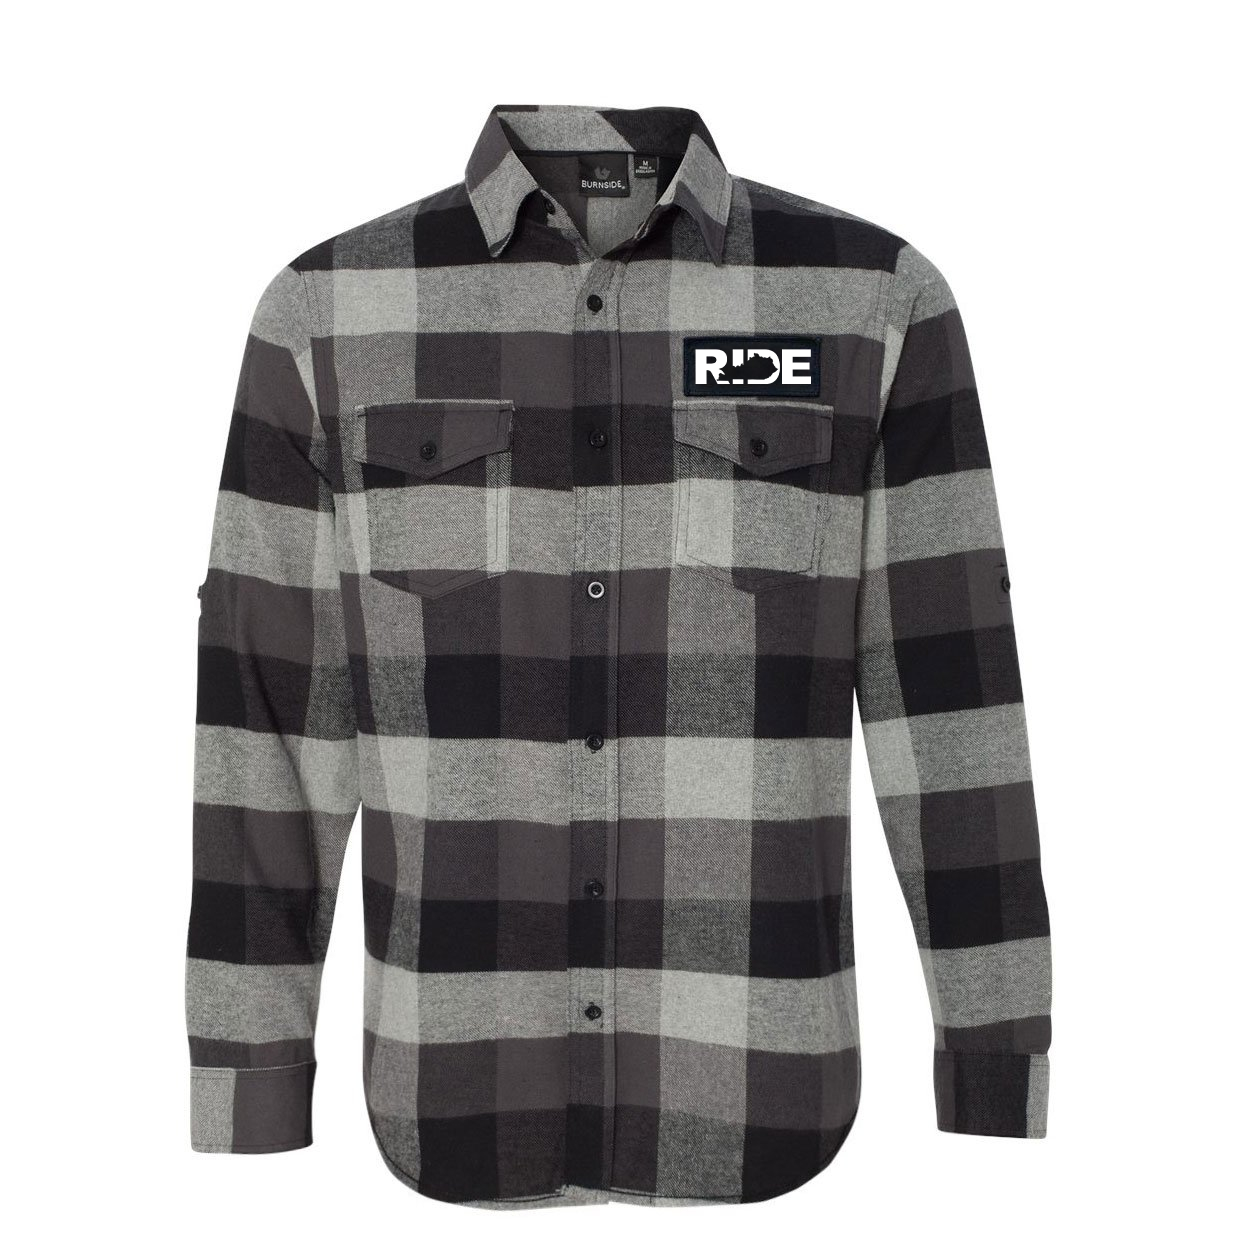 Ride Kentucky Classic Unisex Long Sleeve Woven Patch Flannel Shirt Black/Gray (White Logo)